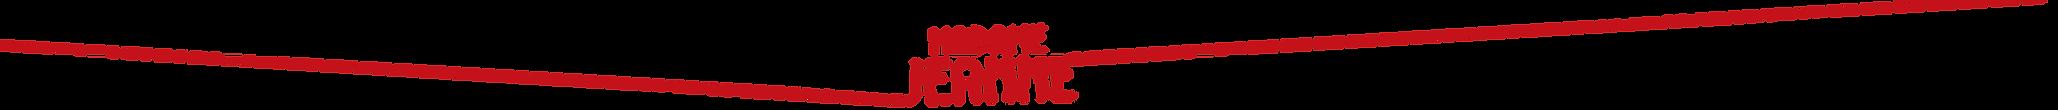 Logo Madame Jeanne 2-Maison Buon Restaur